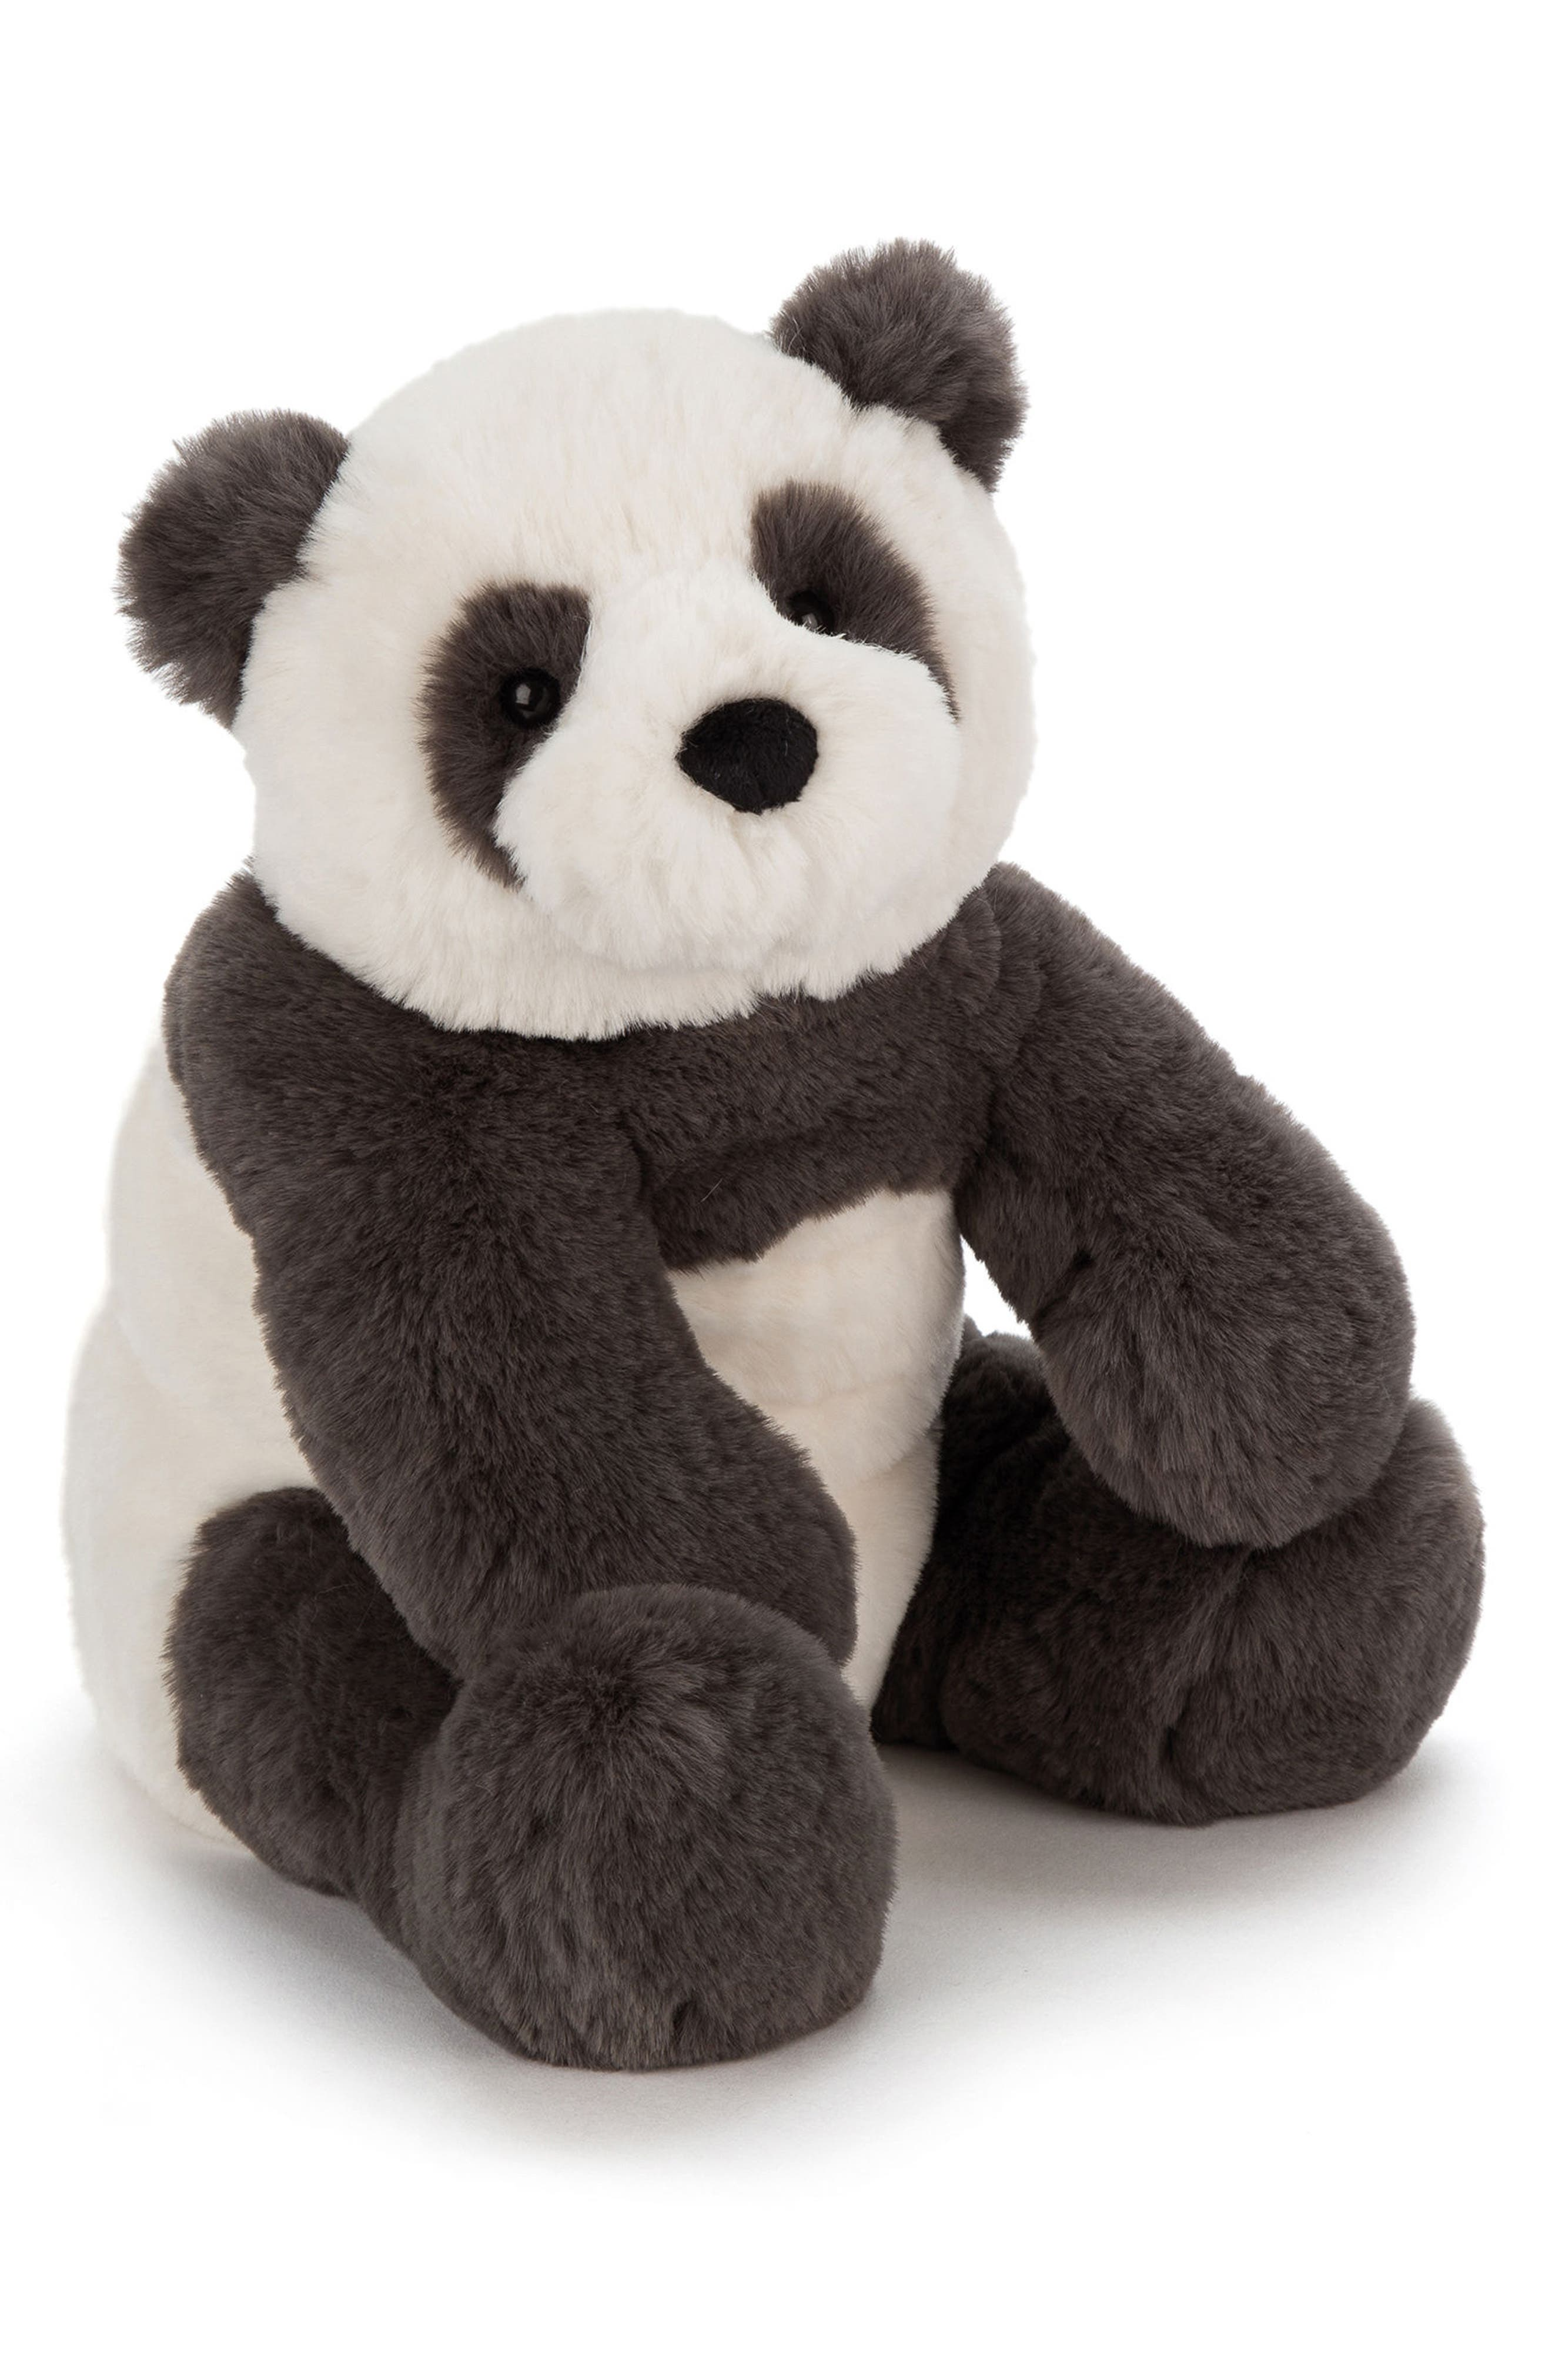 Little Harry Panda Stuffed Animal,                         Main,                         color, Black / Cream